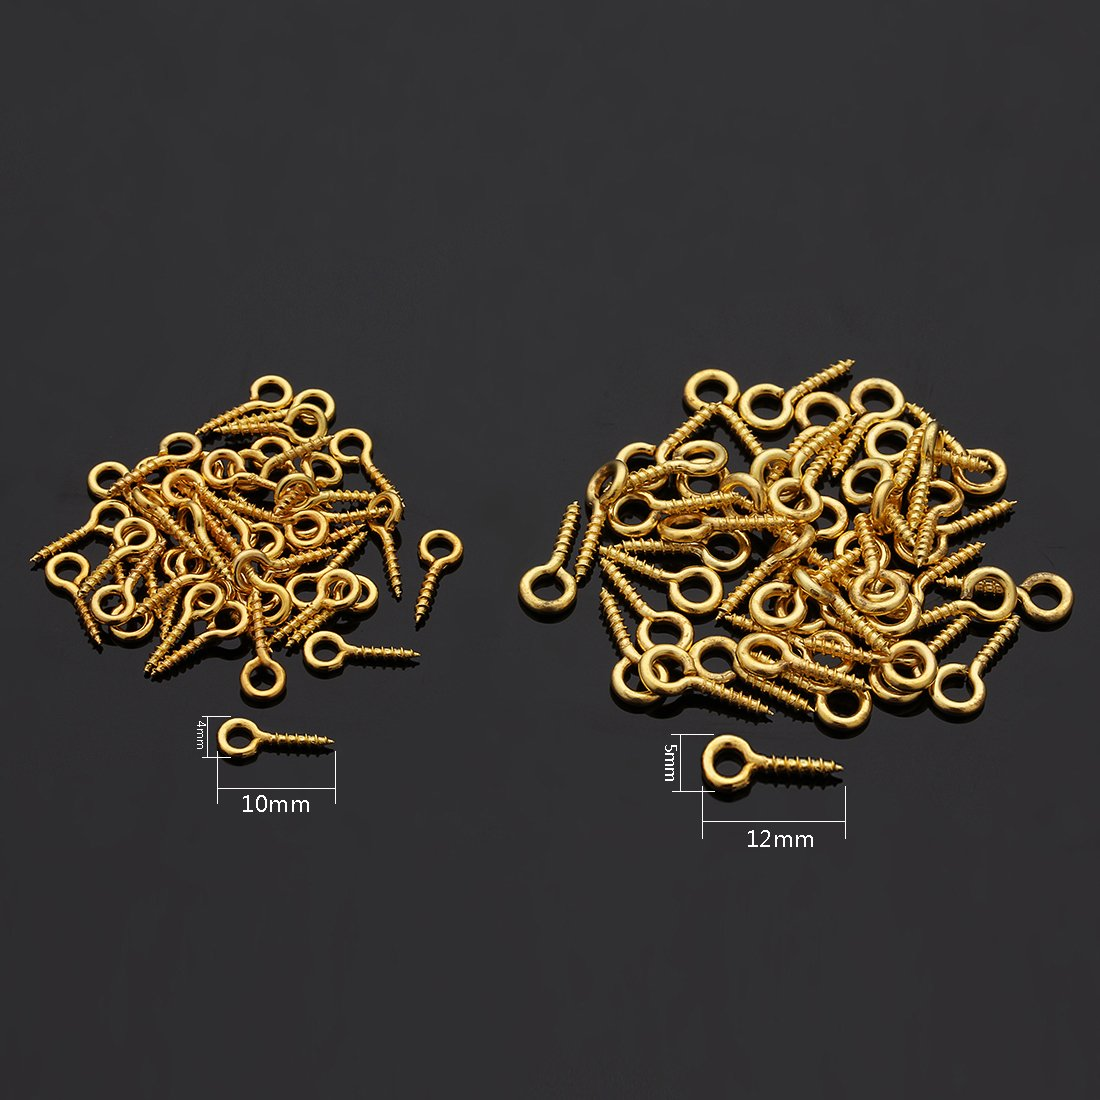 Linsoir Beads 200pcs Sturdy Metal Tiny Screw Eyes Pin Bail Peg 4X10mm Mixed Color 5X12mm